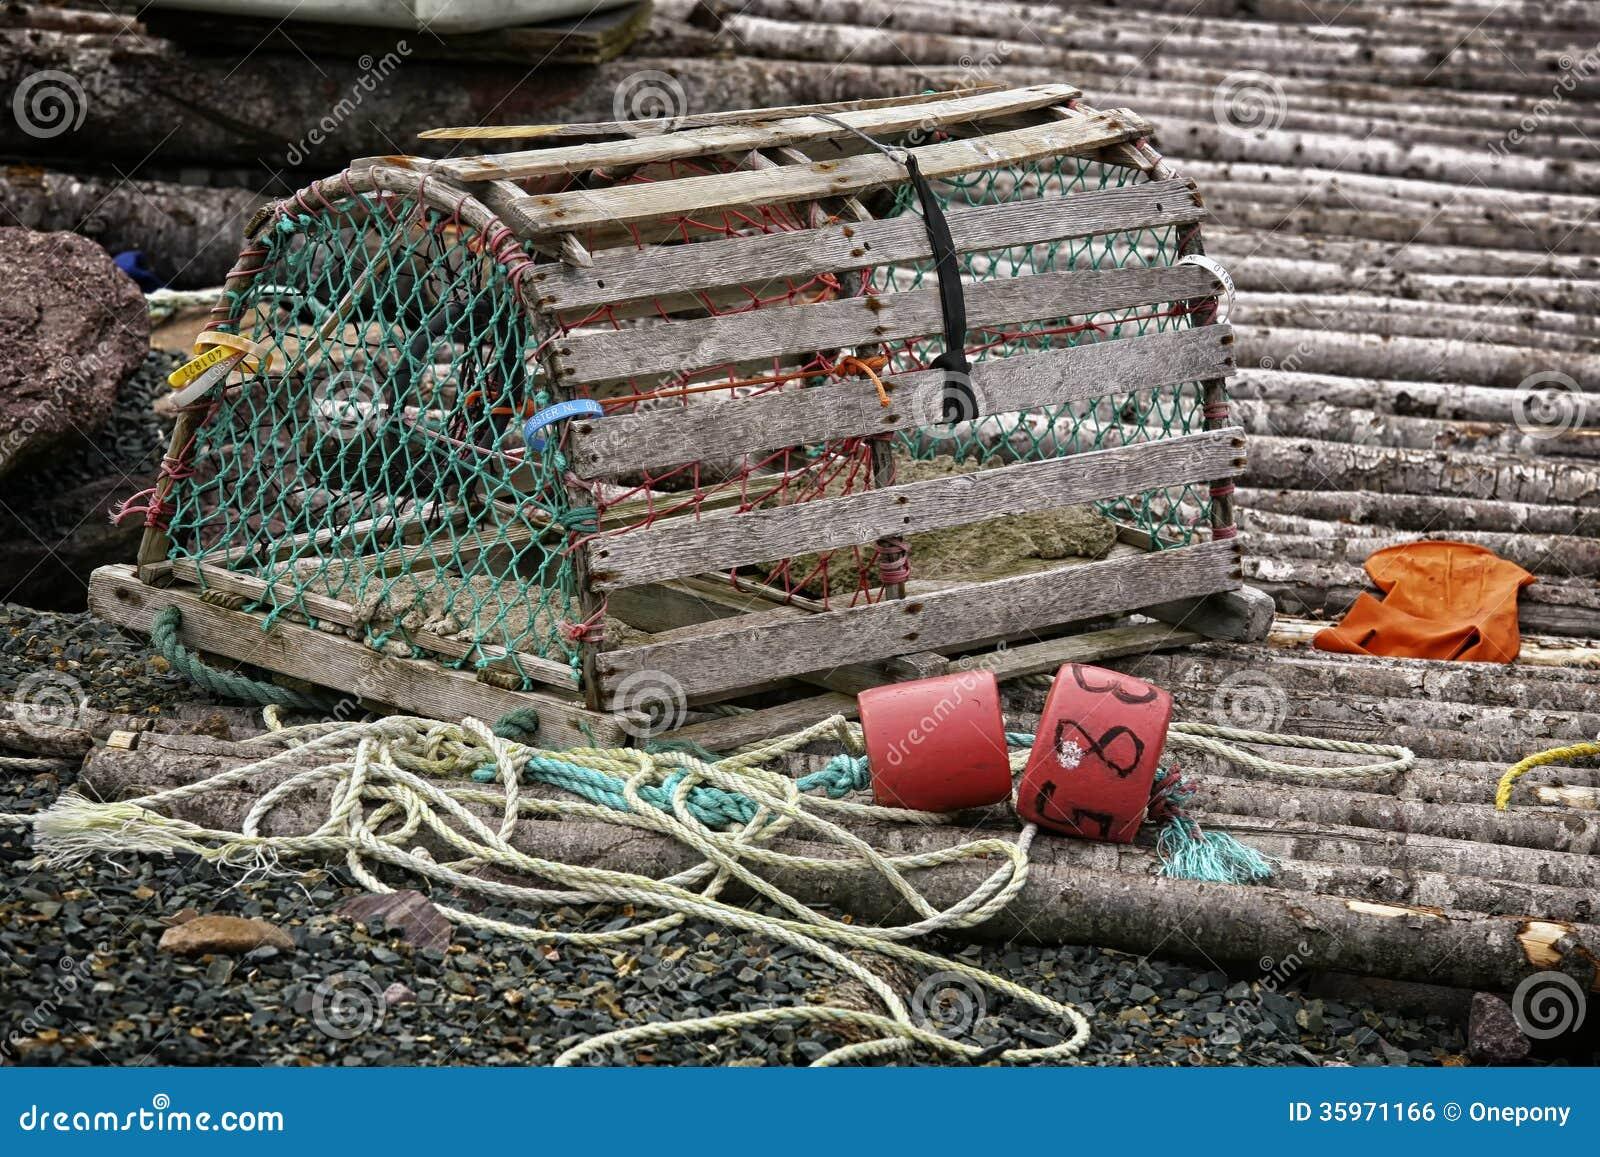 Lobster Trap Supplies Rhode Island